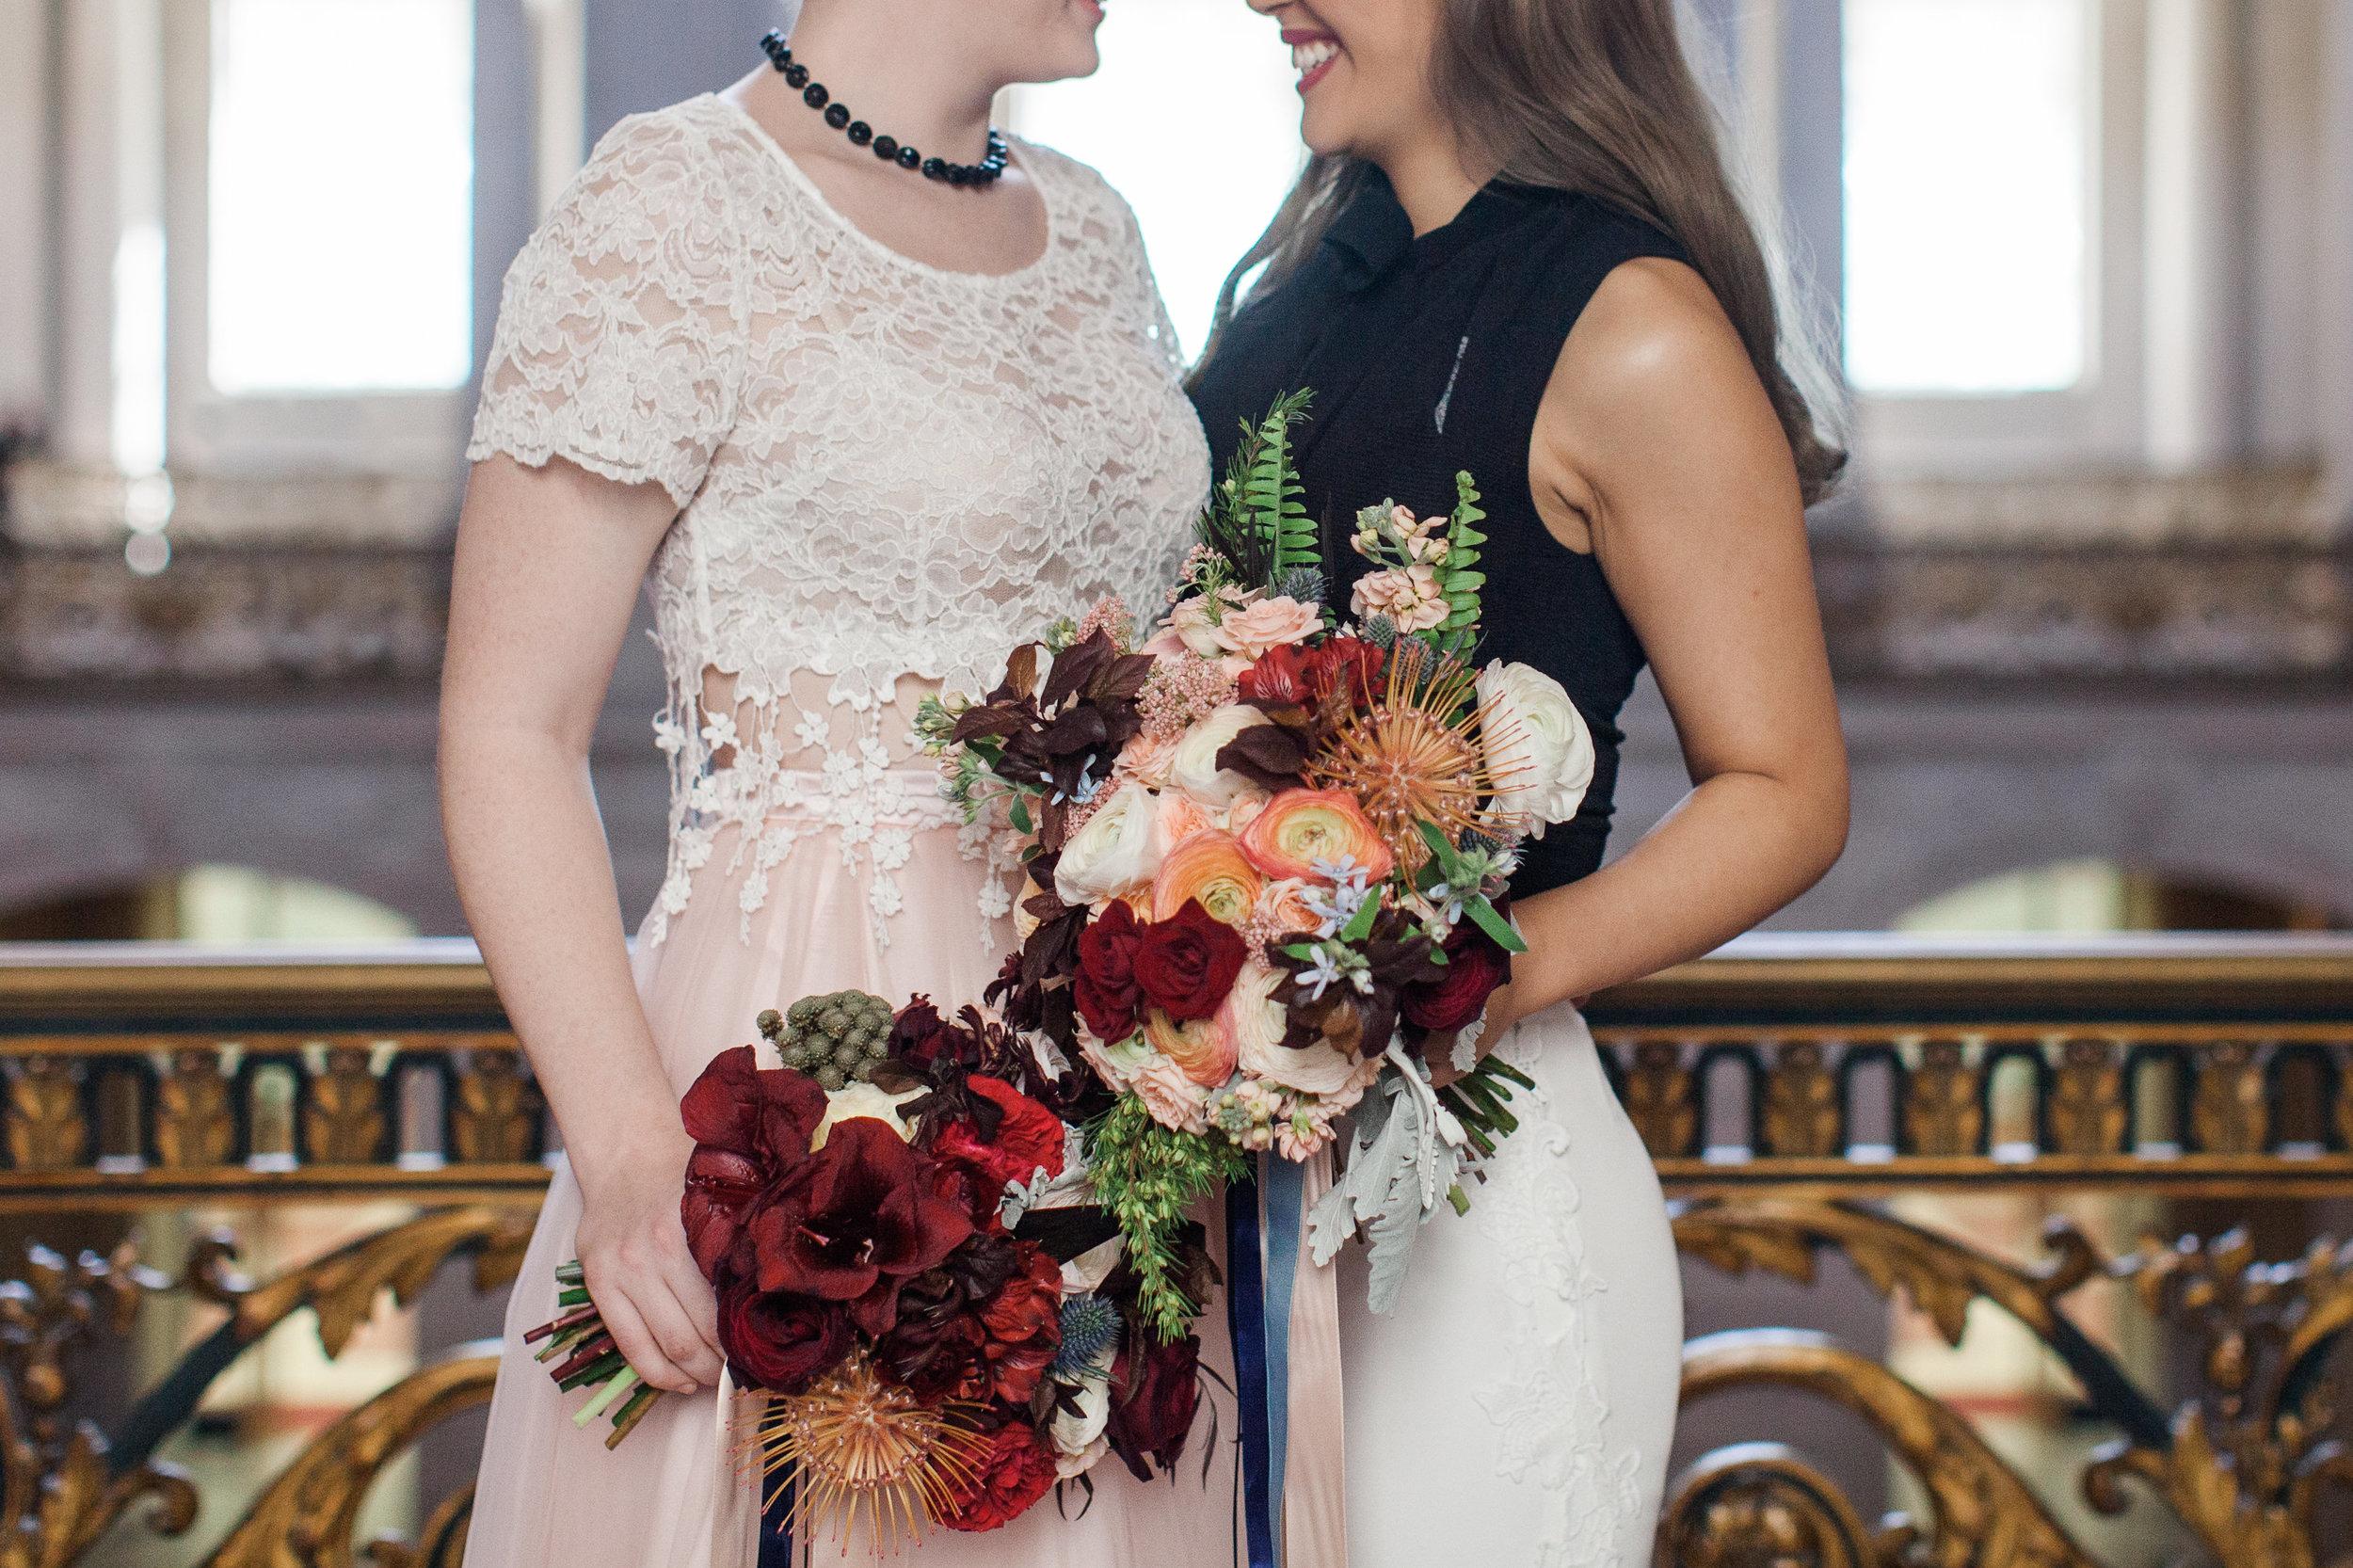 San Francisco City Hall Lesbian LGBTQ Elopement Styled Shoot by Buena Lane Photography